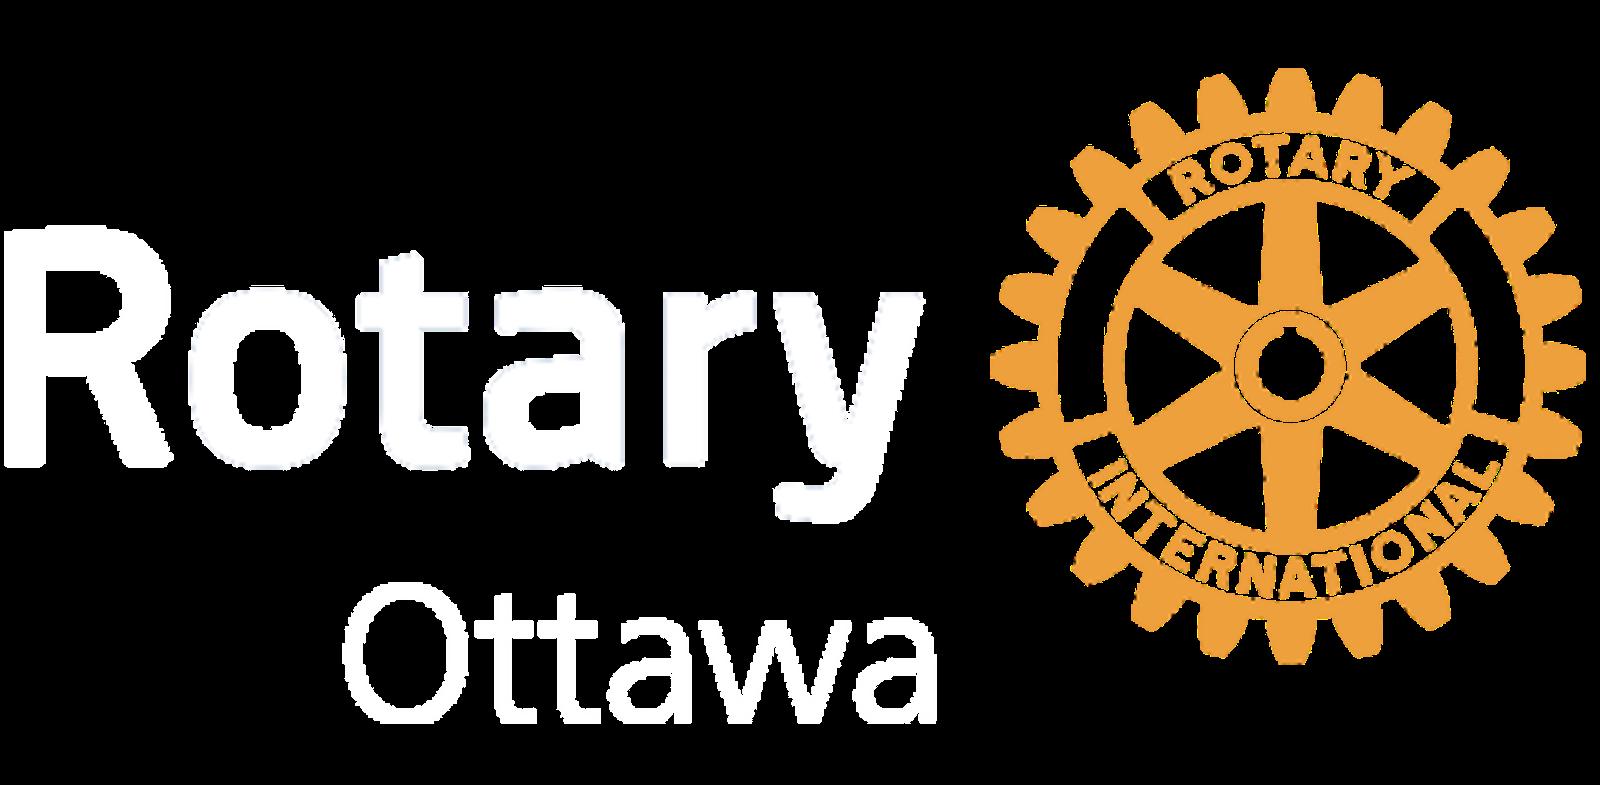 Ottawa-ON logo